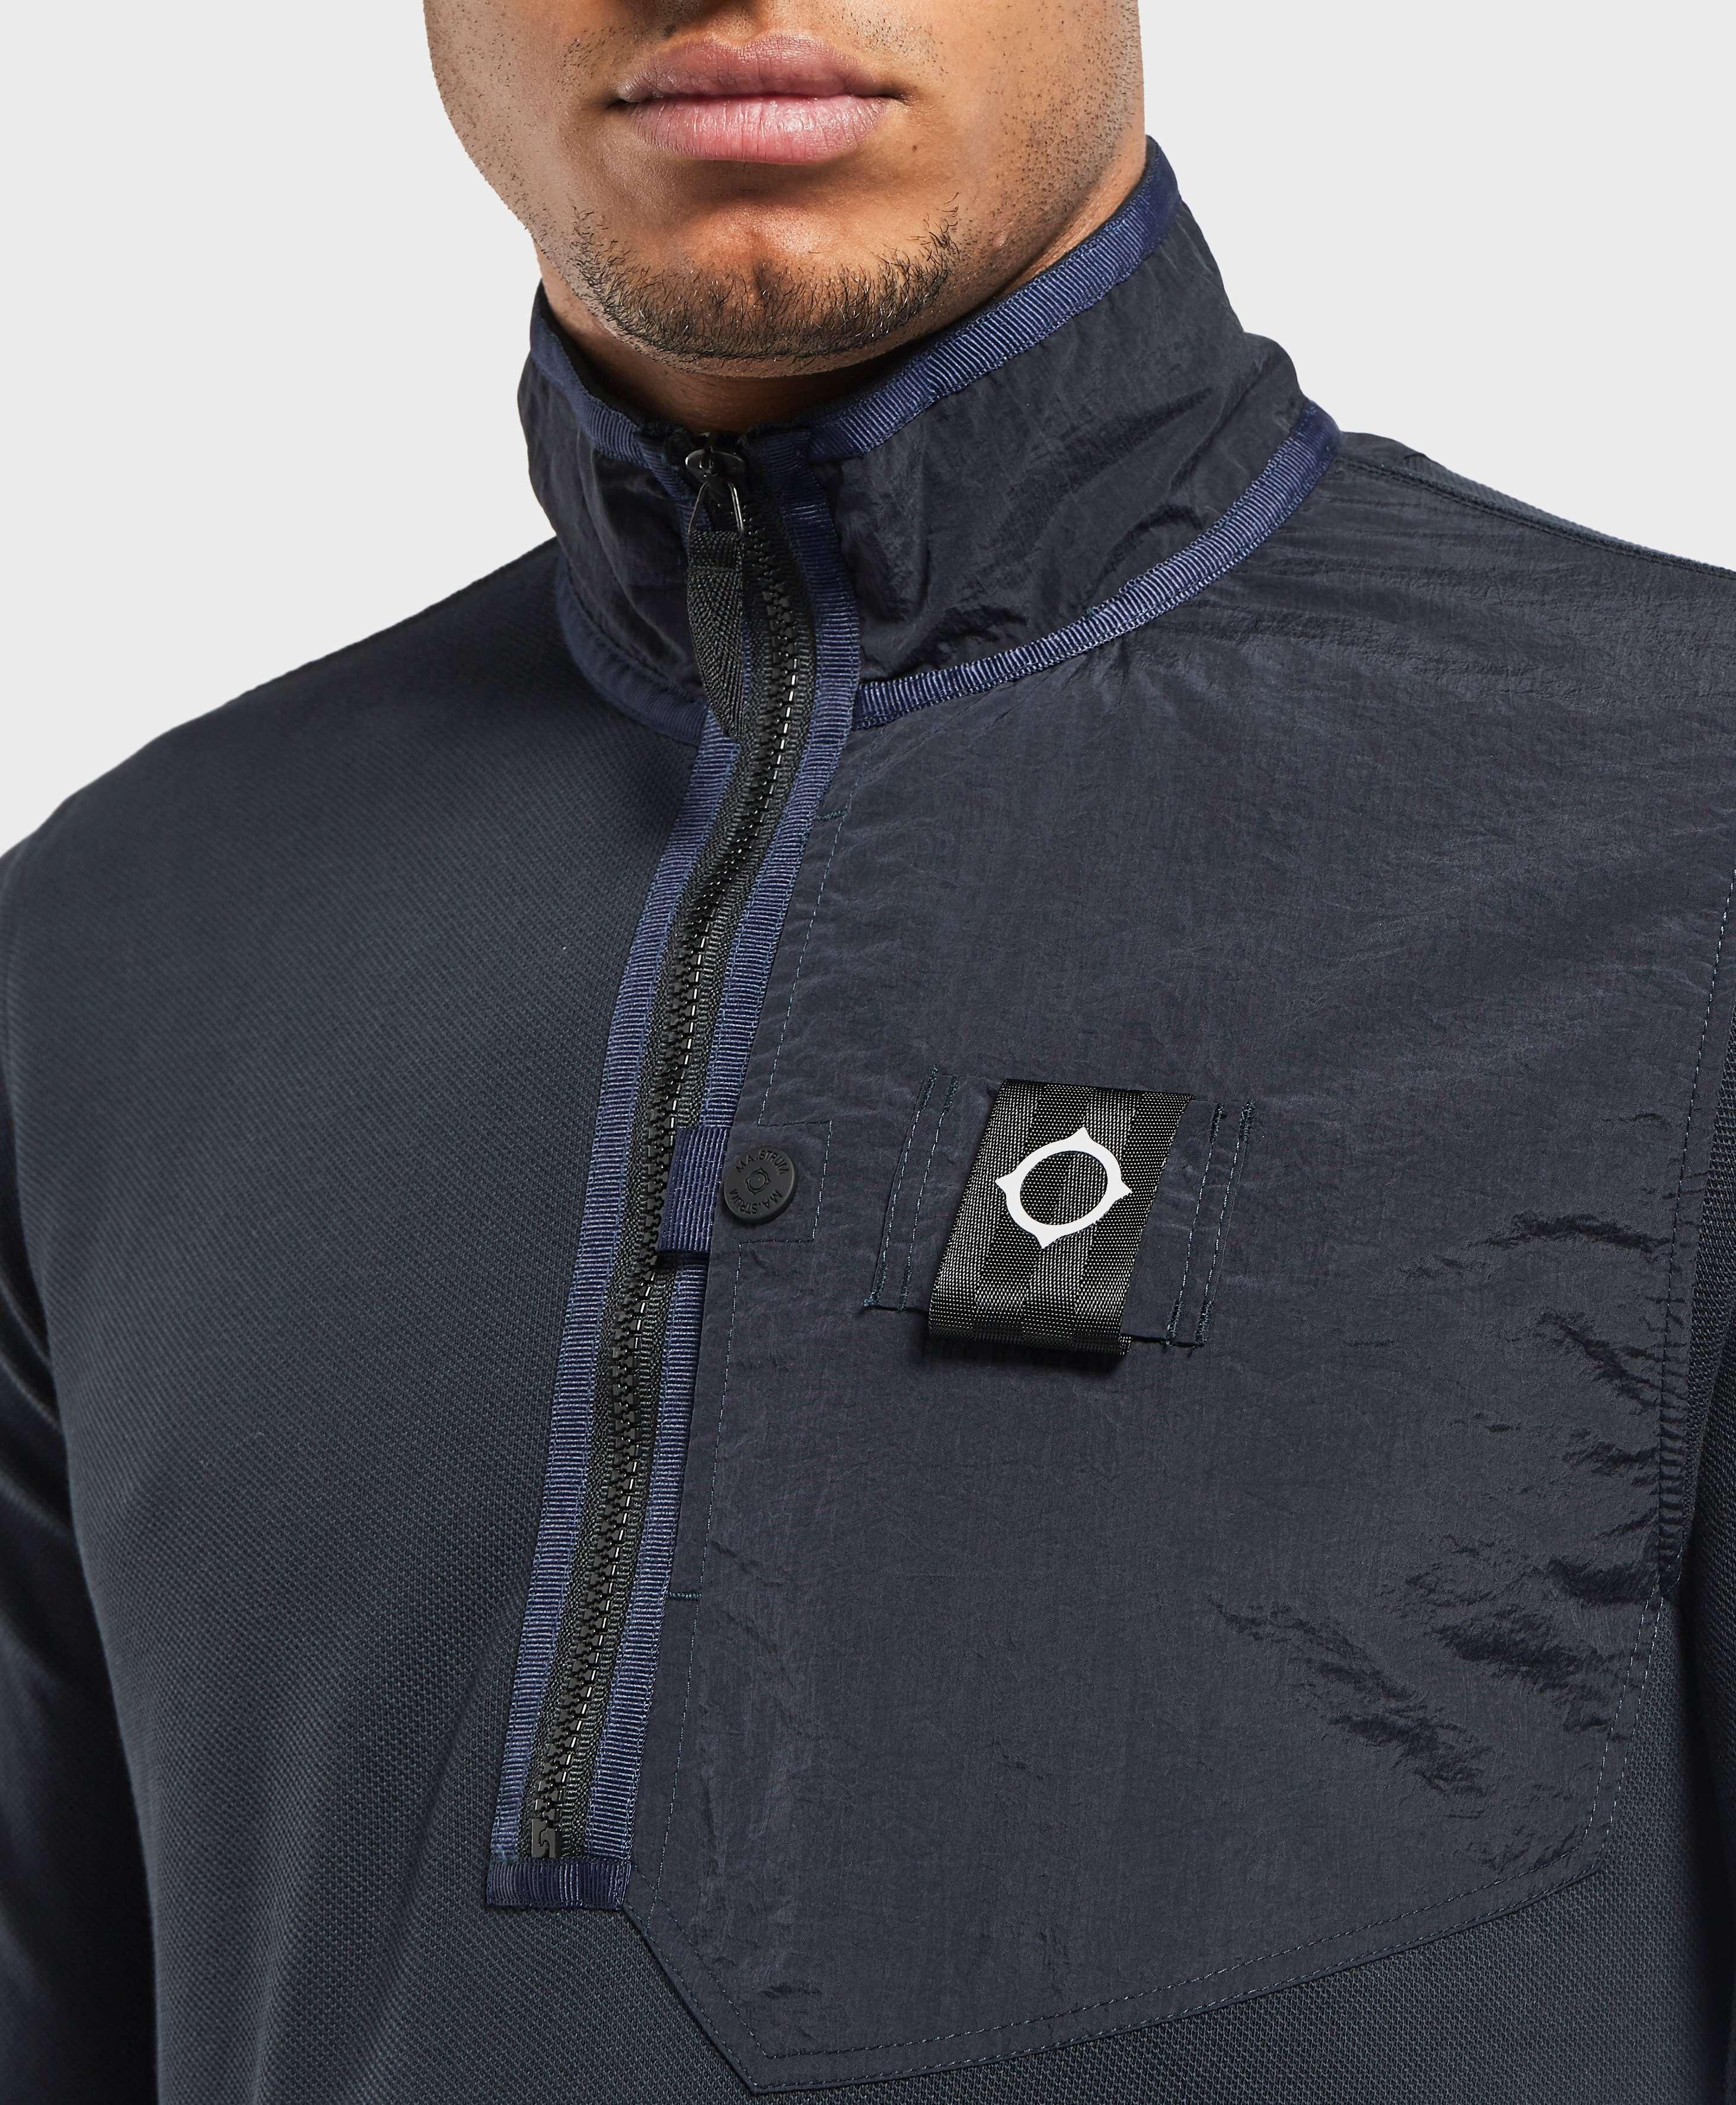 MA STRUM Panel Pocket Quarter Zip Sweatshirt